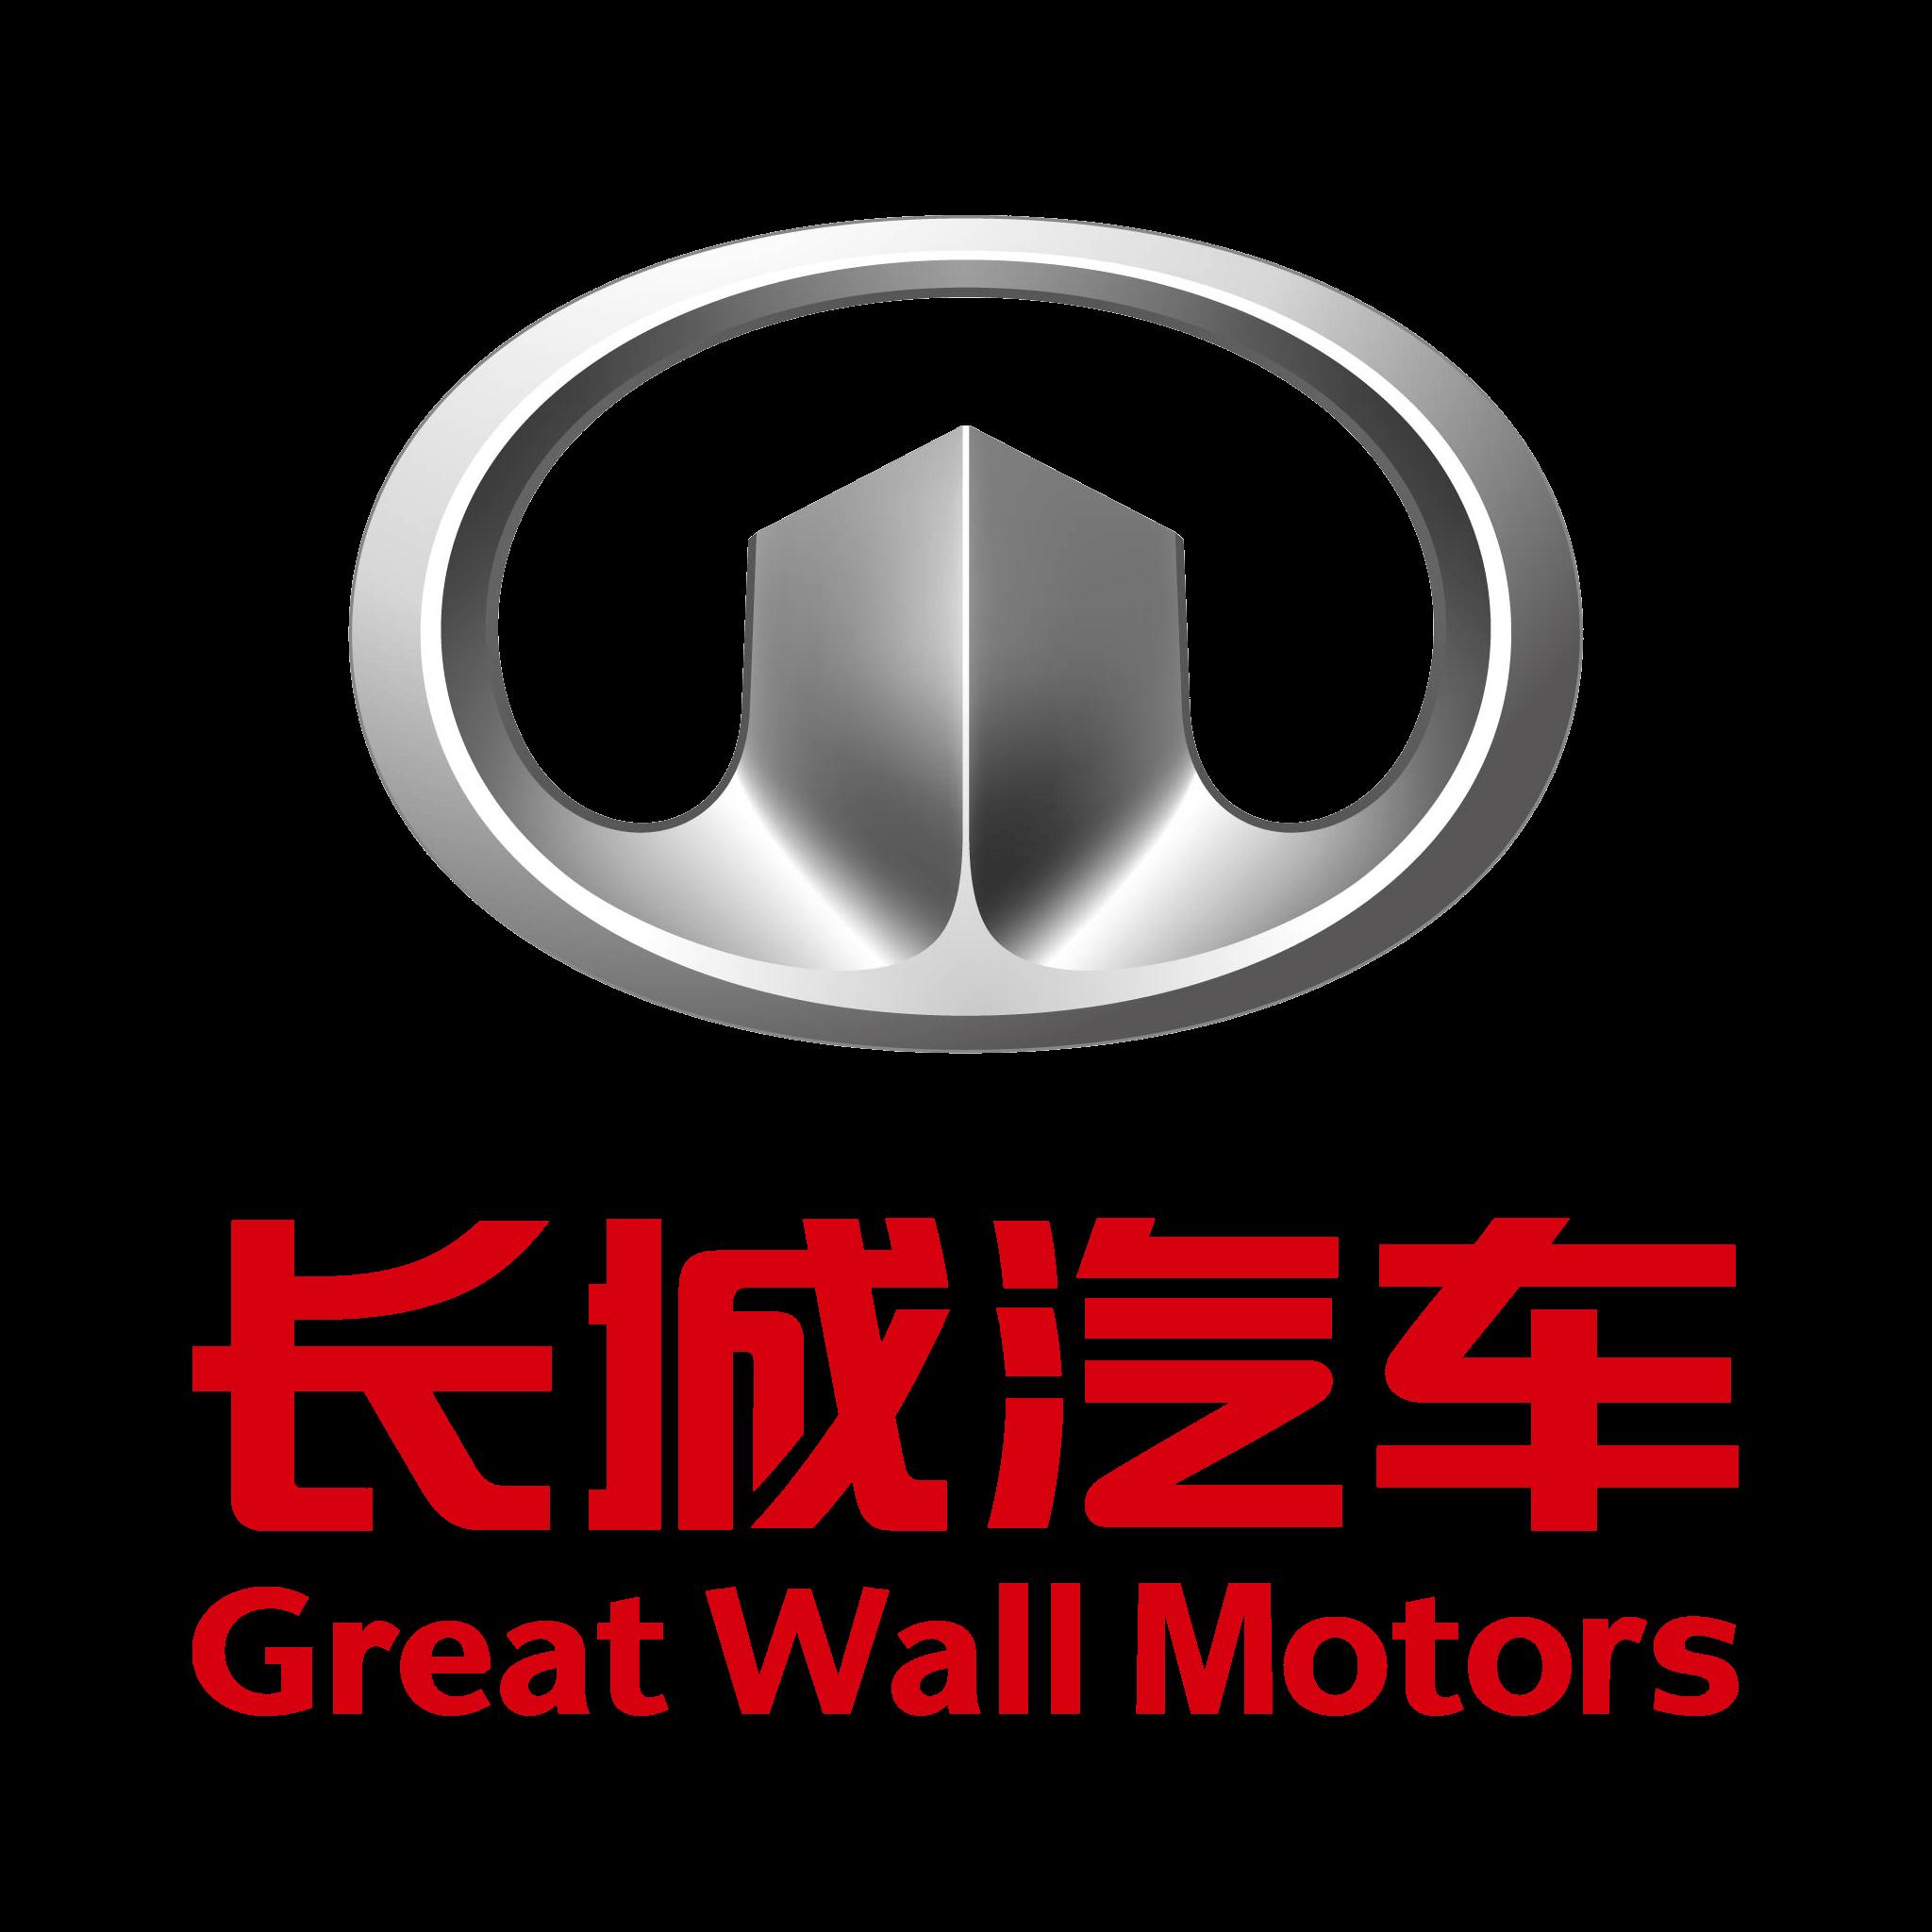 Car Logo Great Wall transparent - 198.1KB